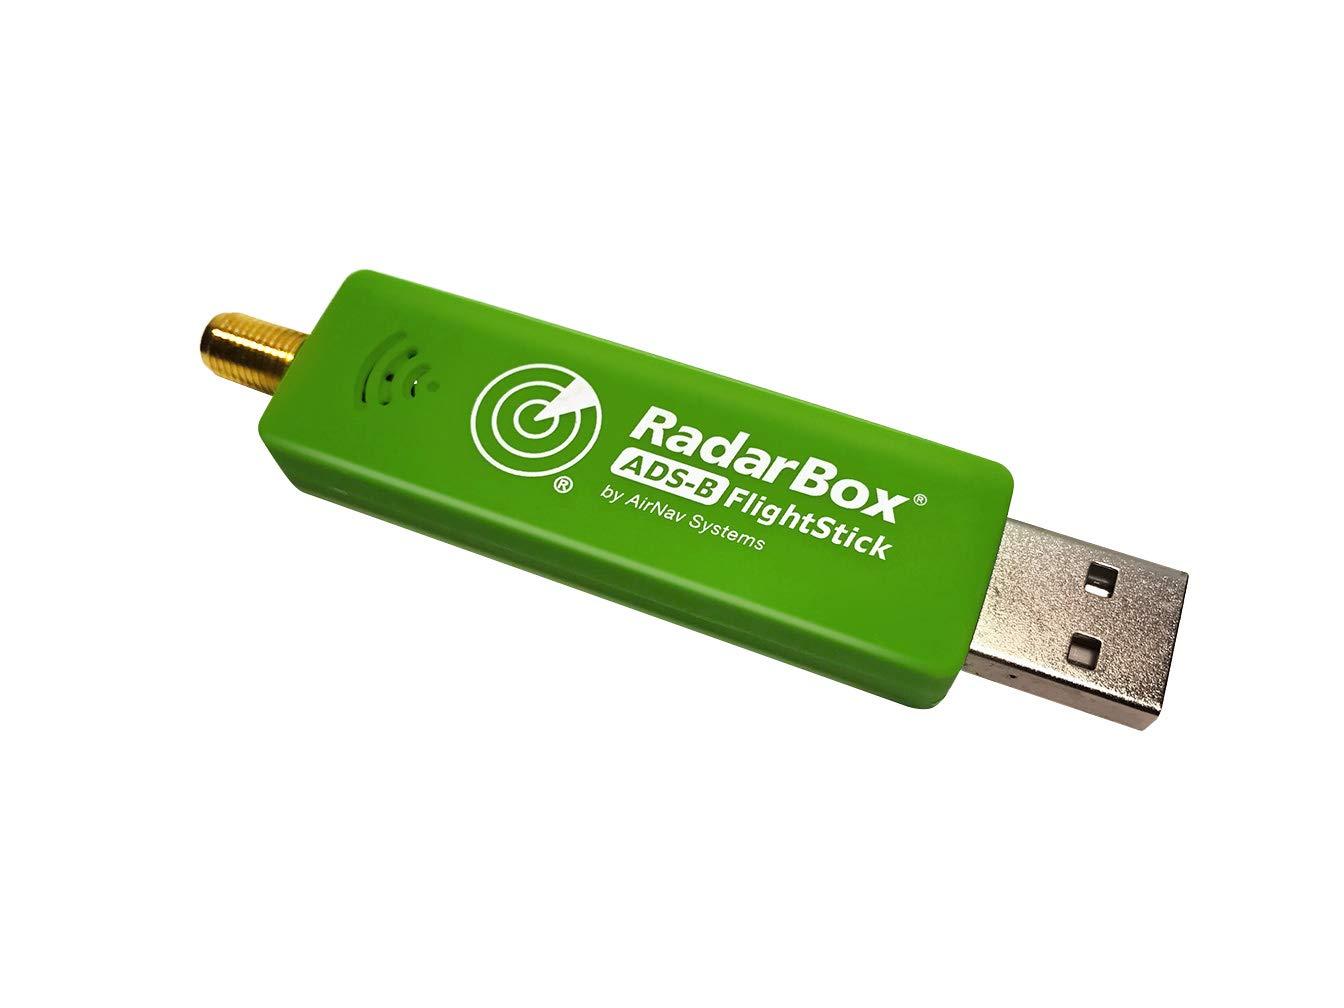 AirNav RadarBox FlightStick - Advanced USB ADS-B Receiver